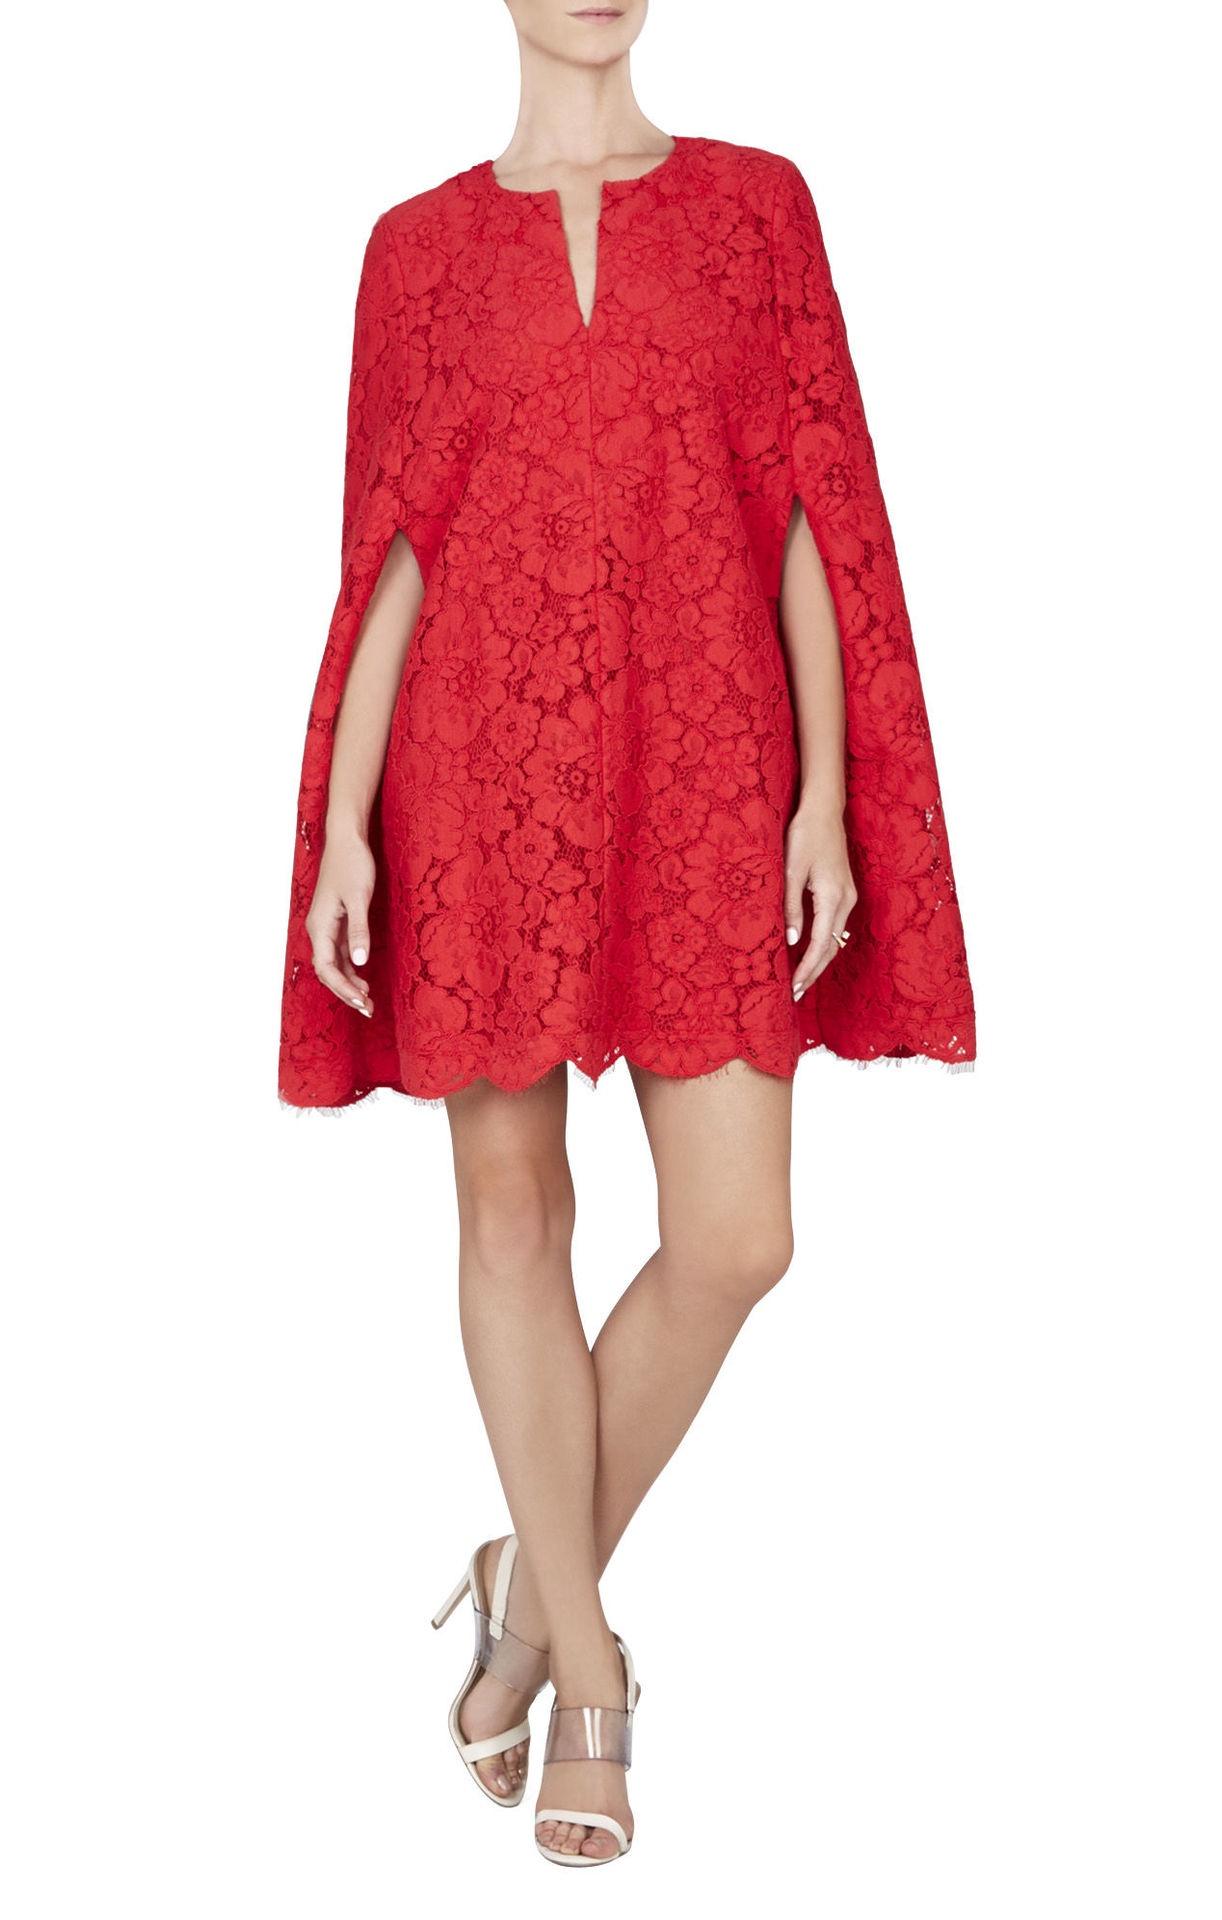 Brynna Dress Image